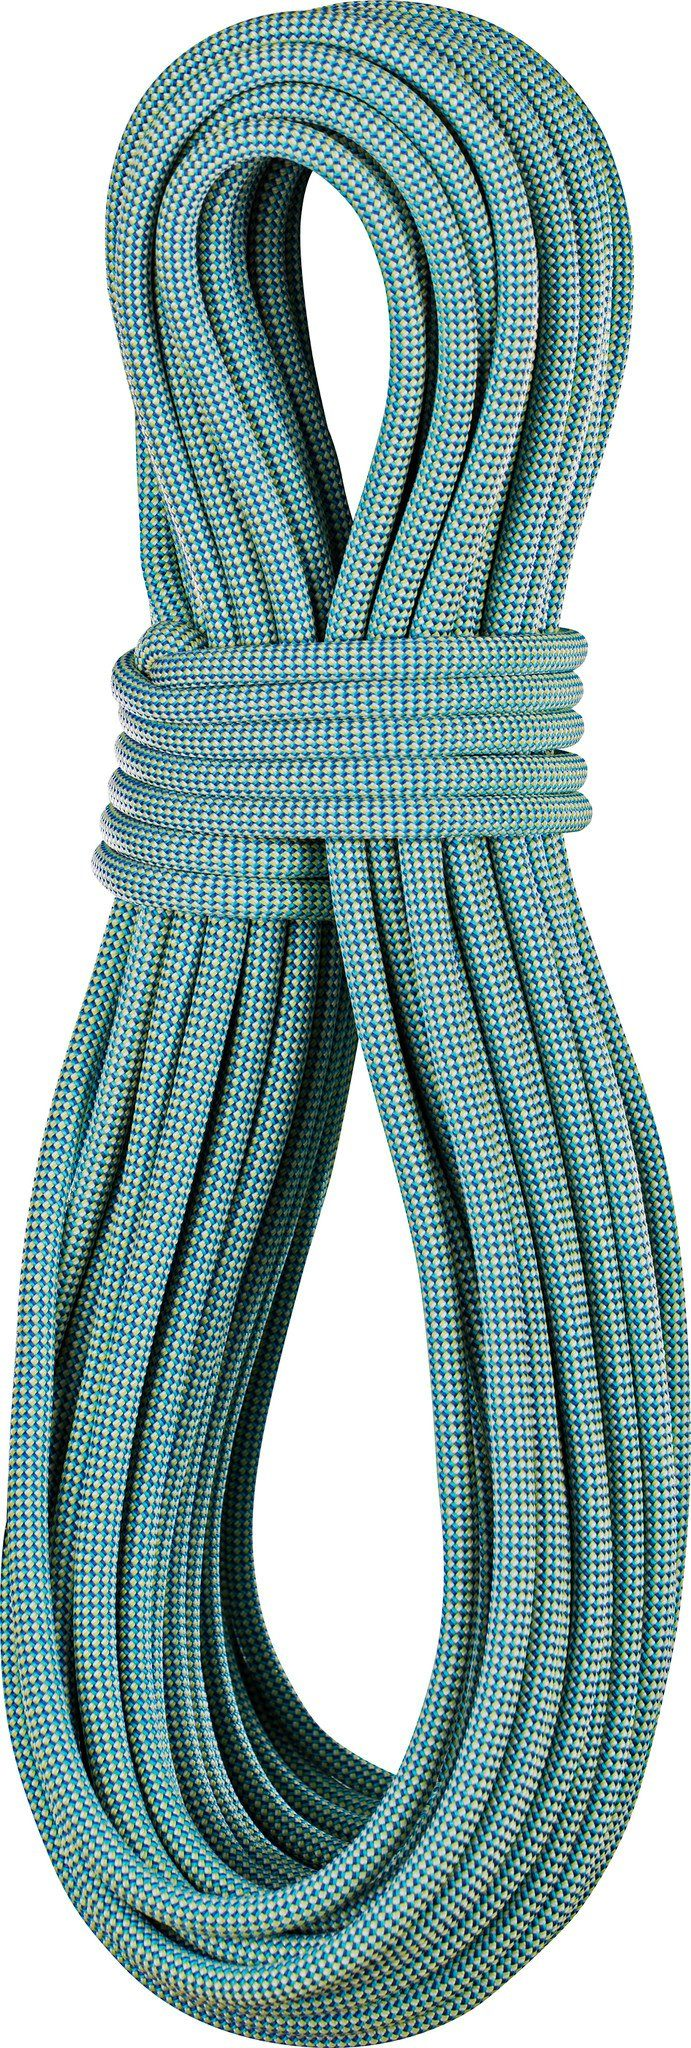 Edelrid Kletterseil »Topaz Pro Dry Rope 9,2mm 70m«